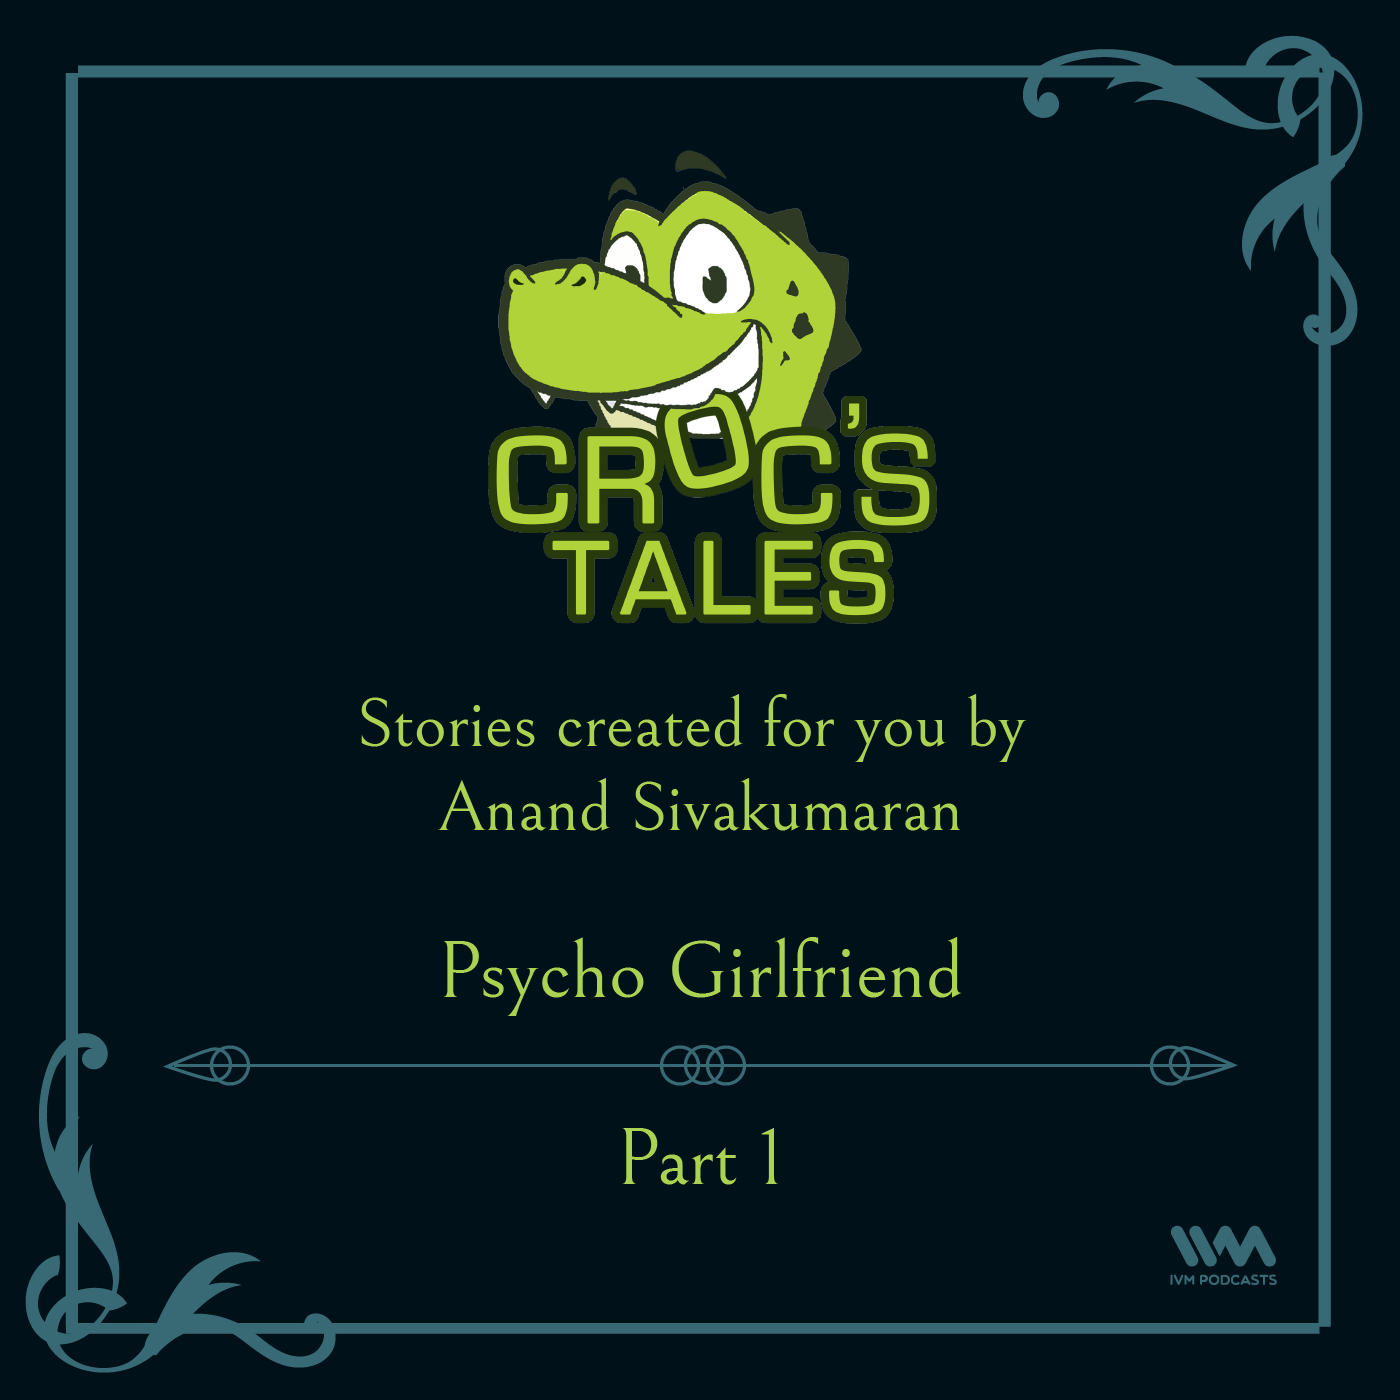 Ep. 83: Psycho Girlfriend (Part 1)